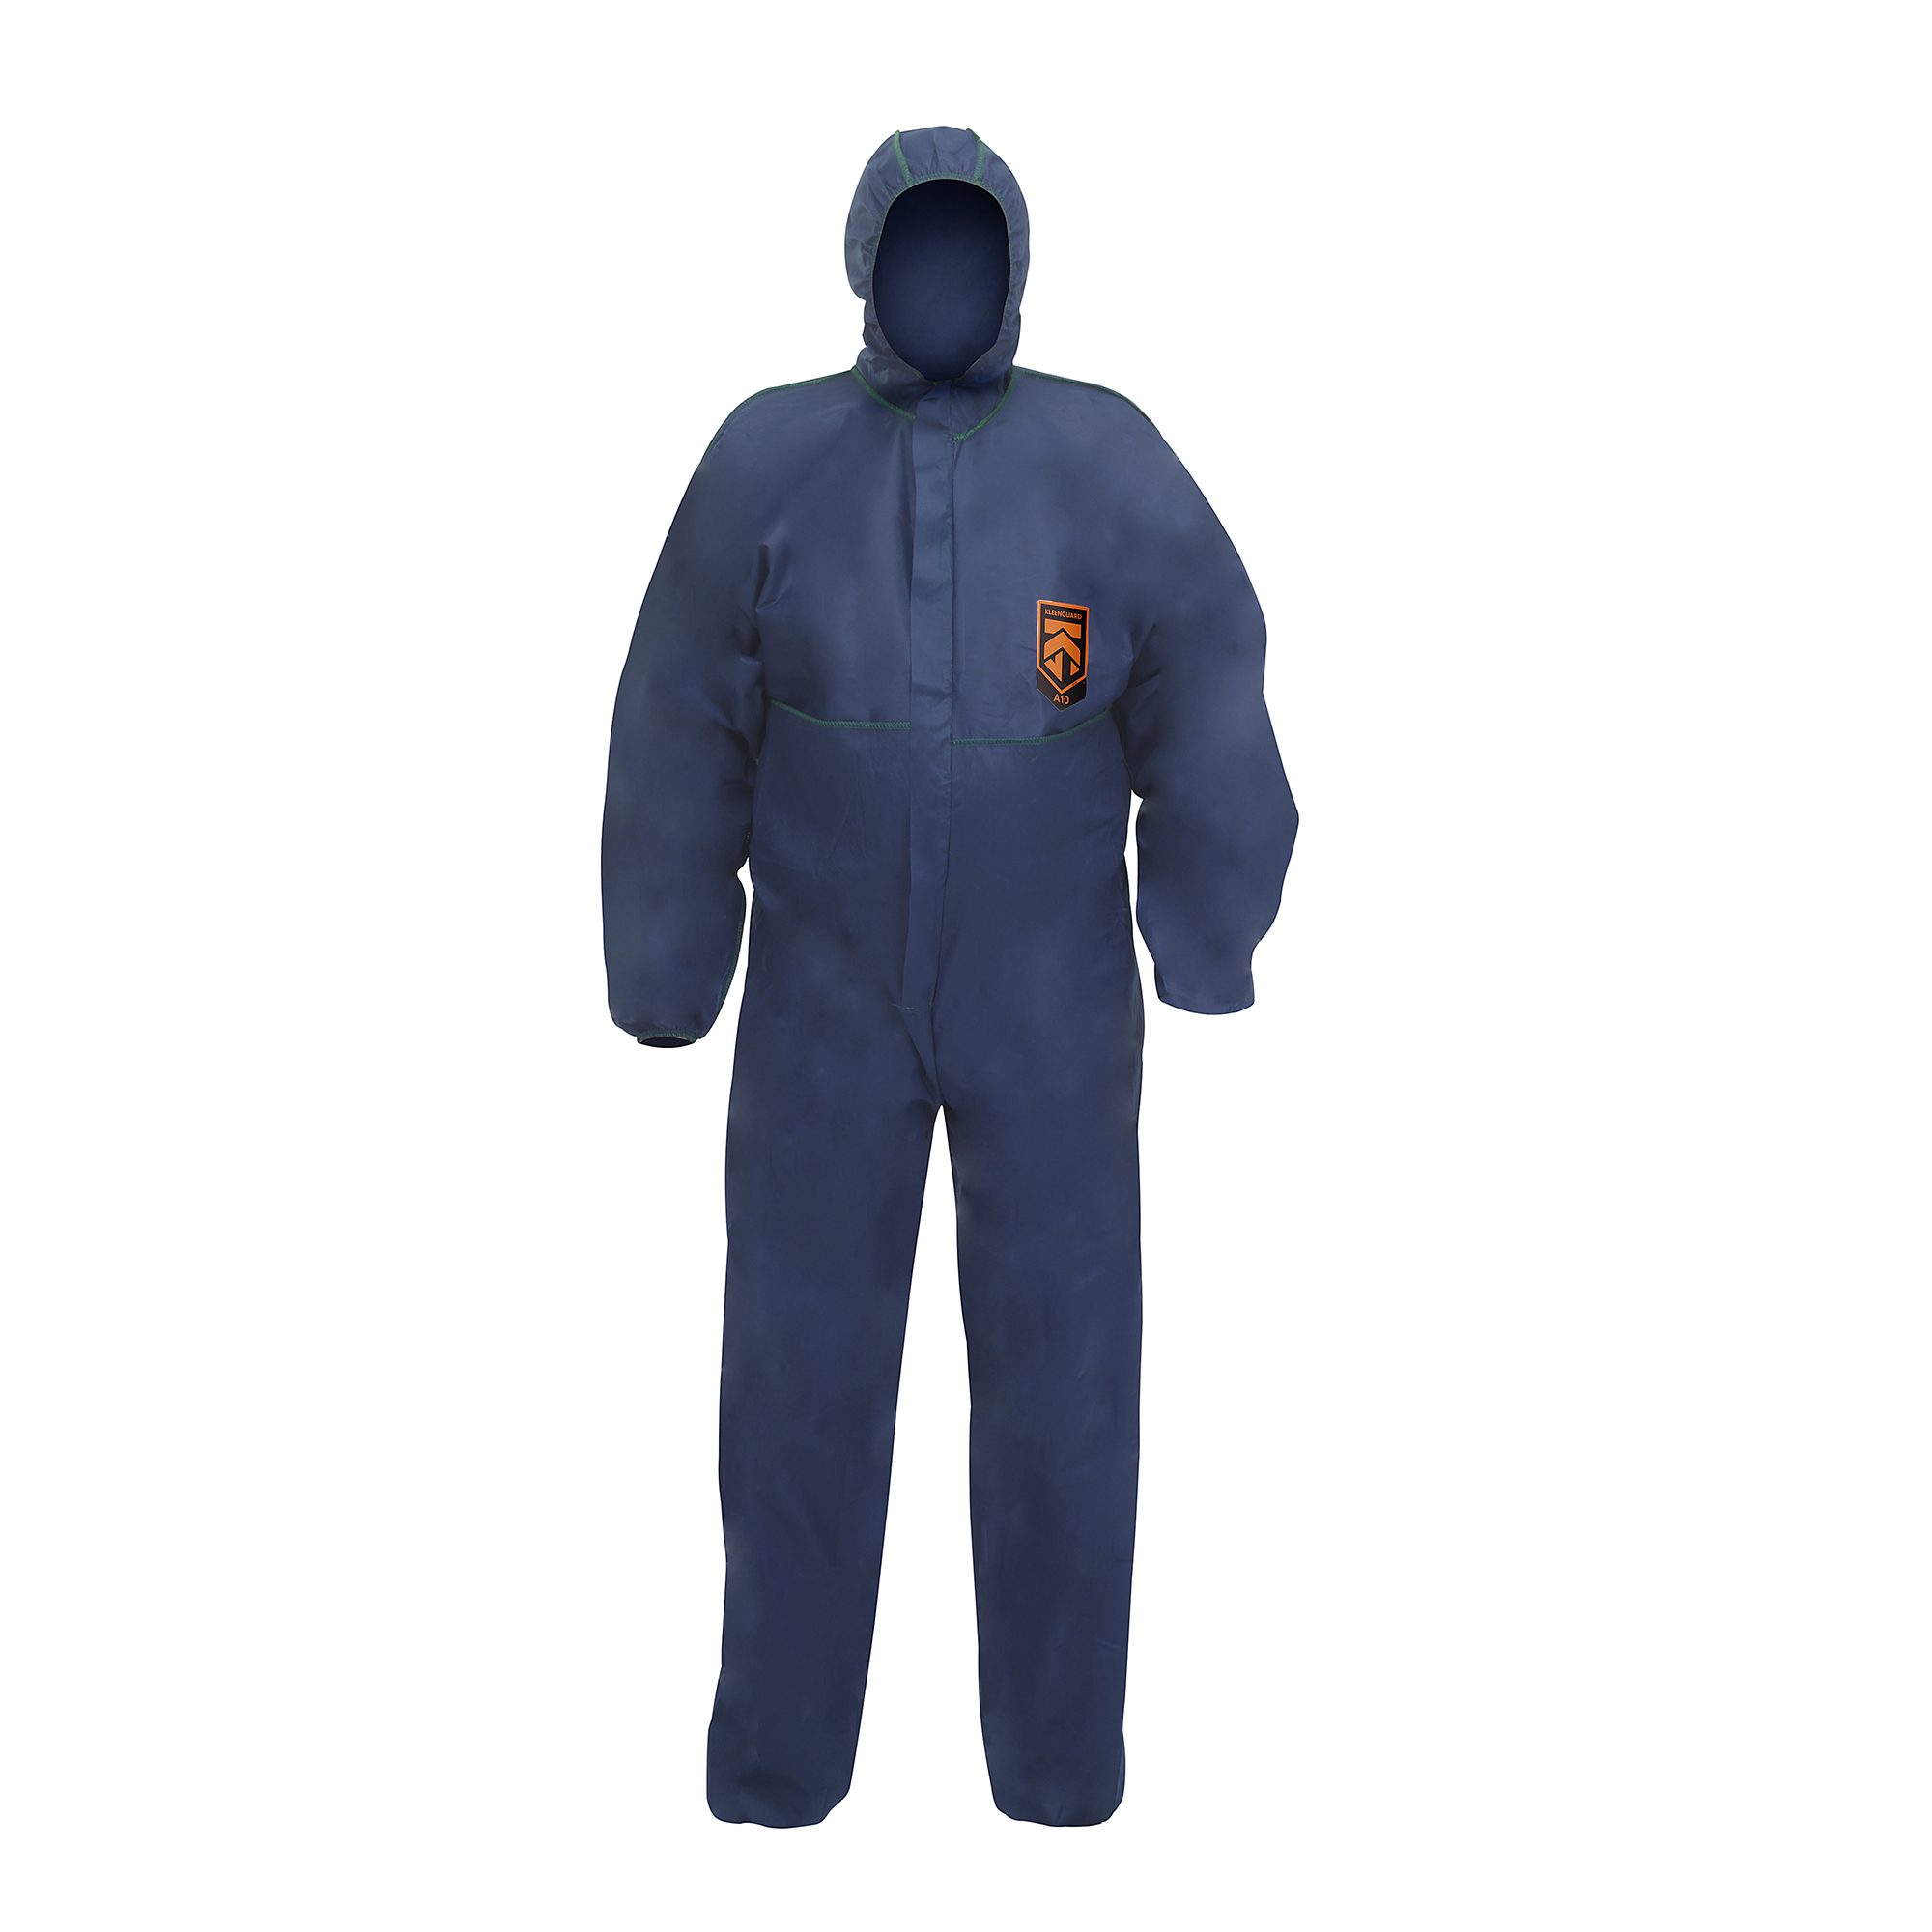 Kleenguard Overall Gr.XL A25 weiß Maleranzug Einweg-Overall Einmalschutzanzug